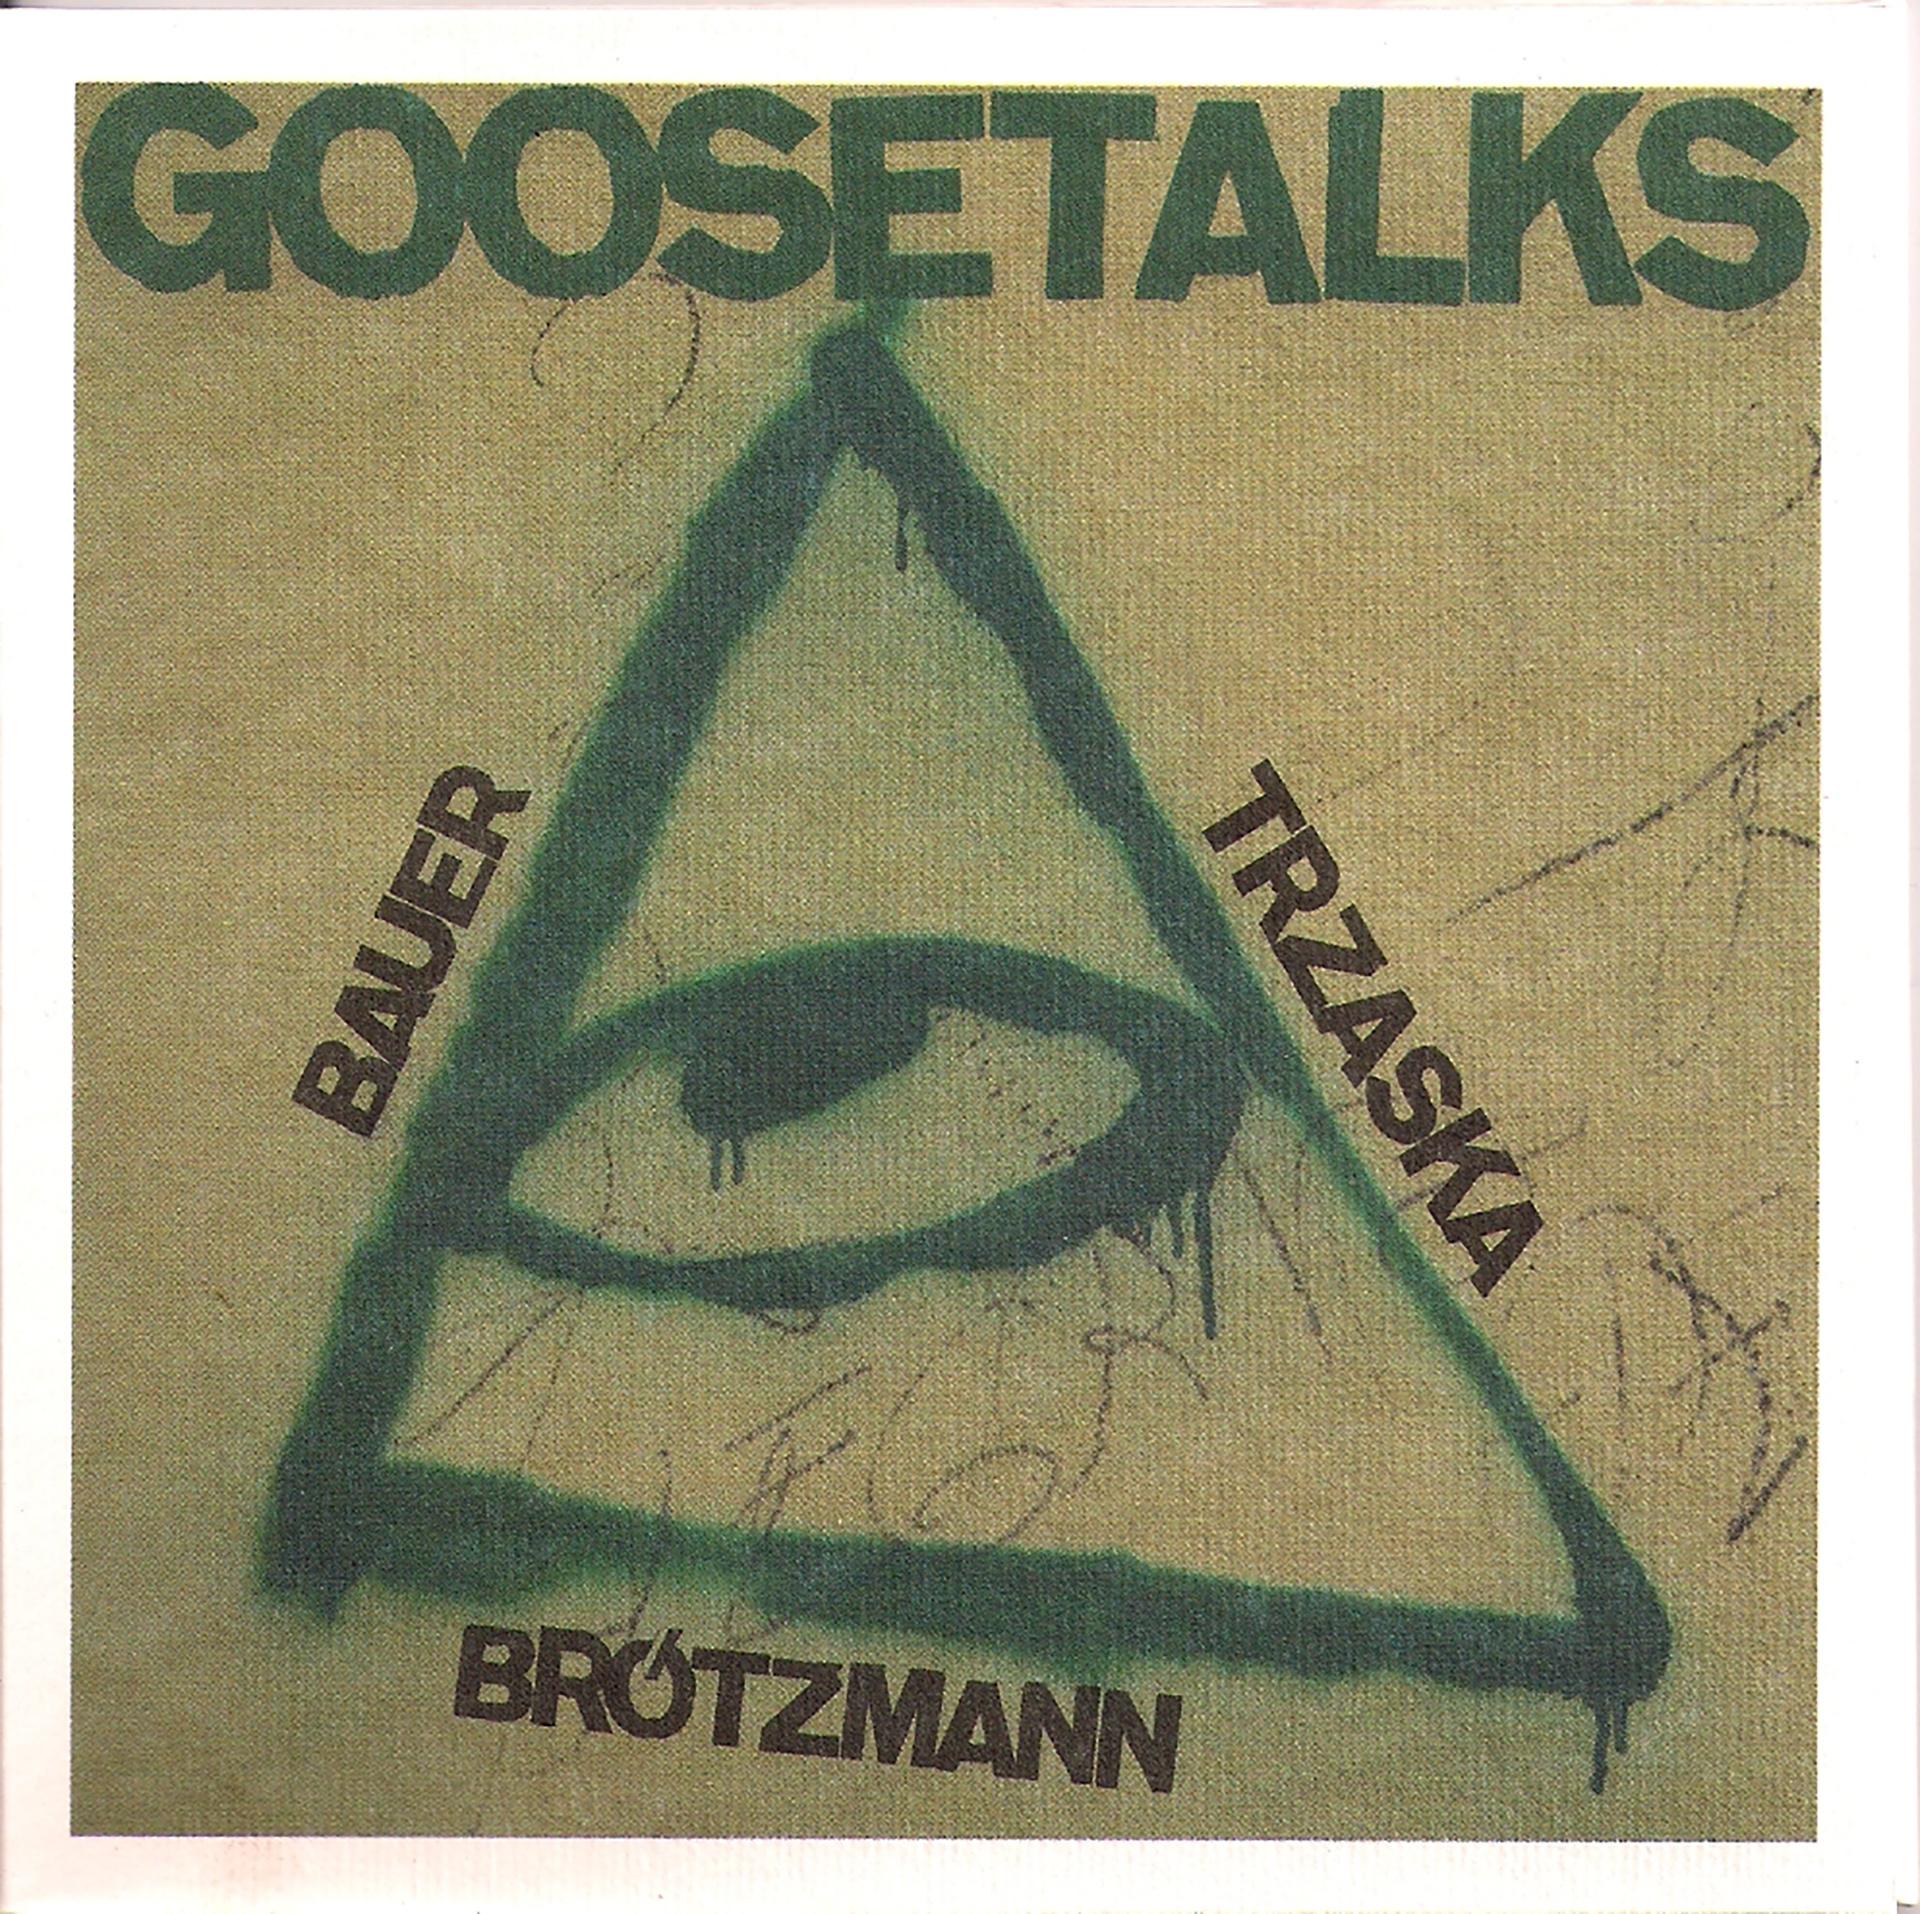 BAUER / BROTZMANN / TRZASKA – GOOSETALK